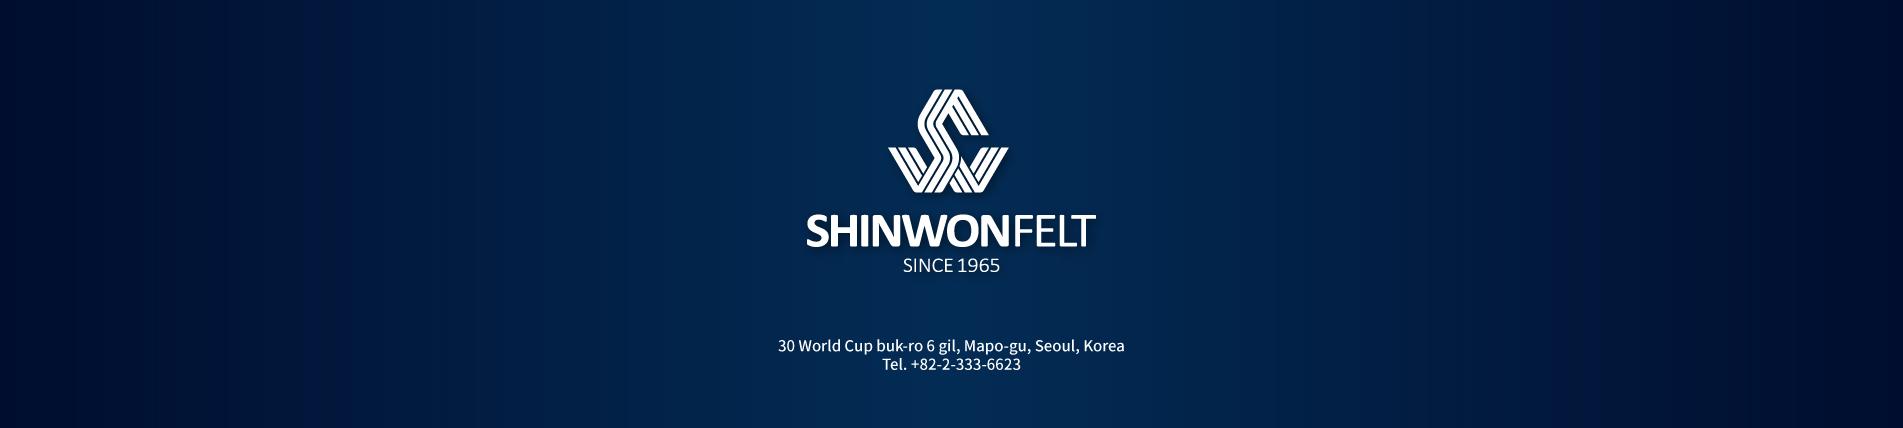 SHINWON FELT Co., Ltd. Main Image